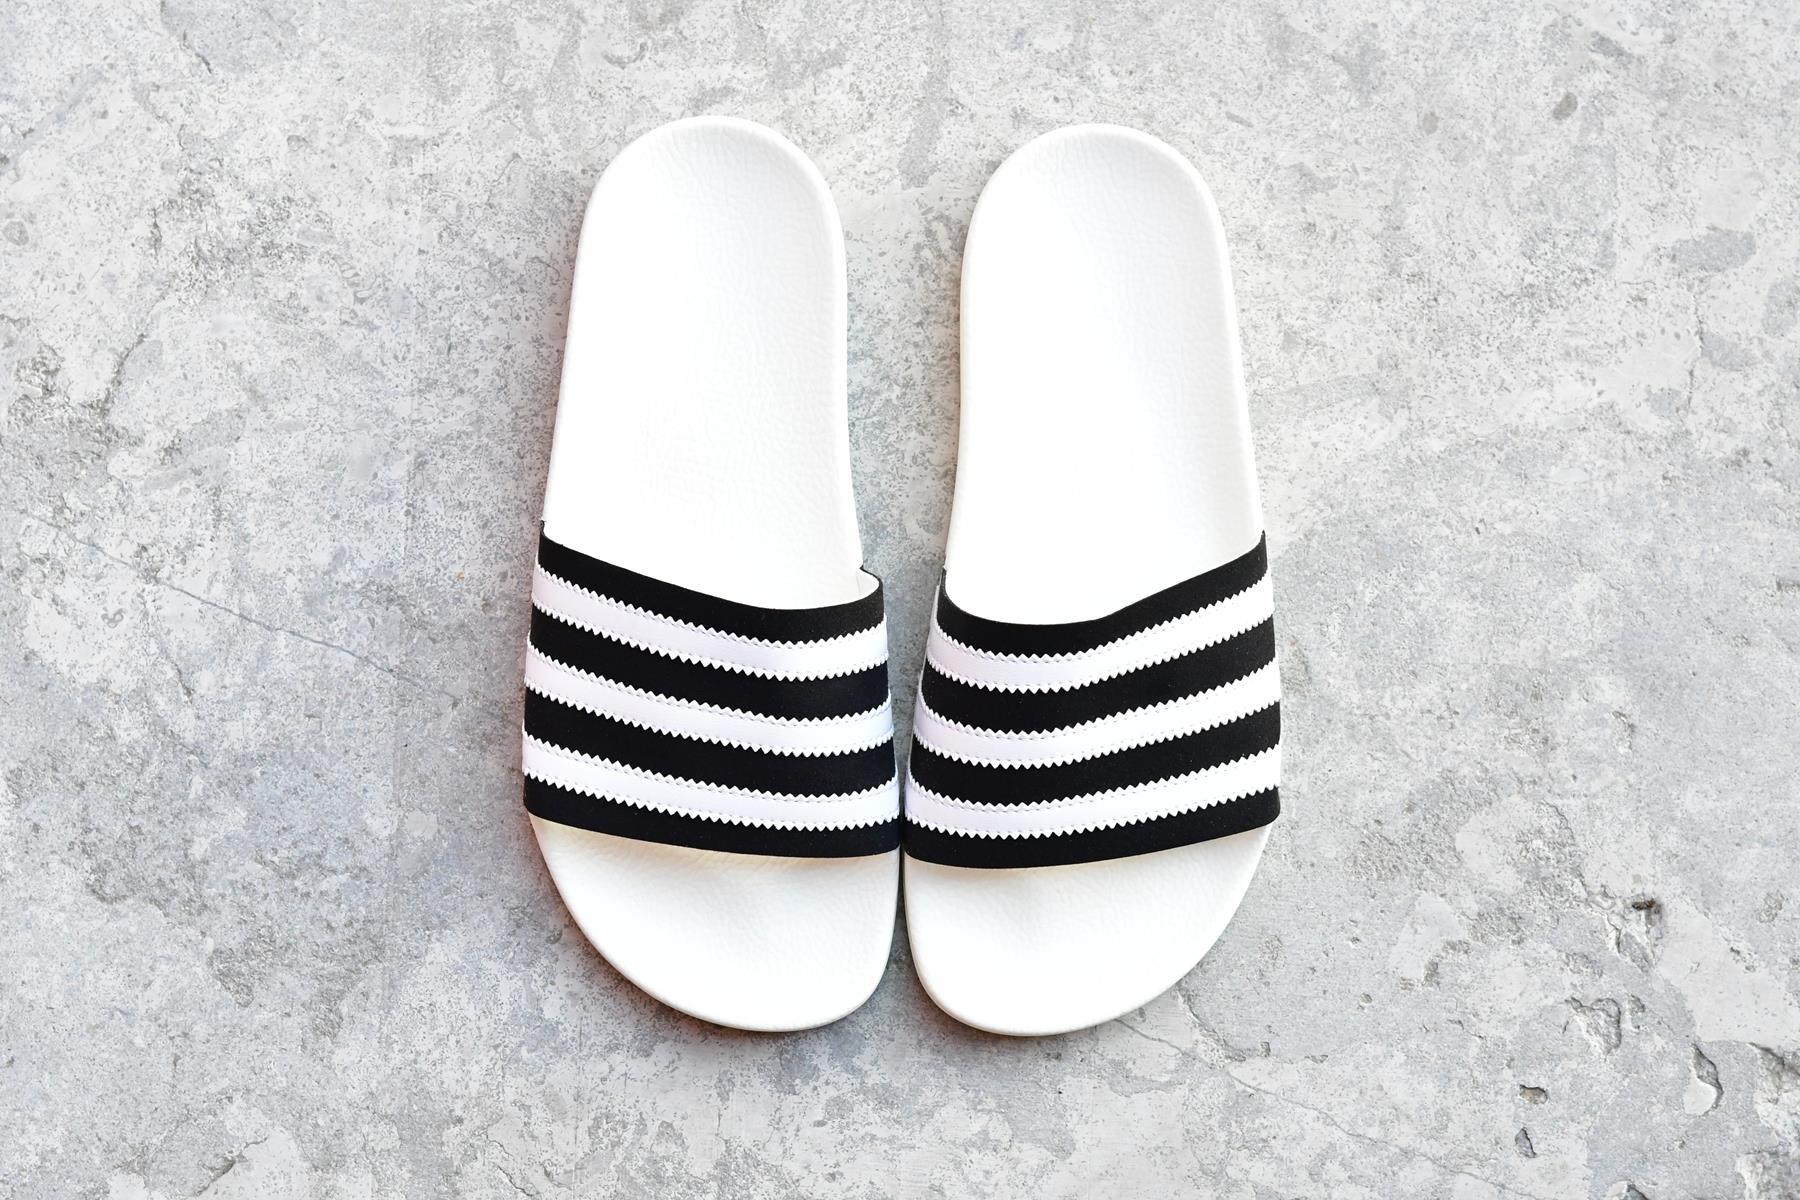 BD7592_AmorShoes-adidas-Originals-Adilette-Core-Black-Footwear-White-Off-White-chancla-pala-negra-microante-negro-rayas-blancas-suela-goma-blanca-BD7592